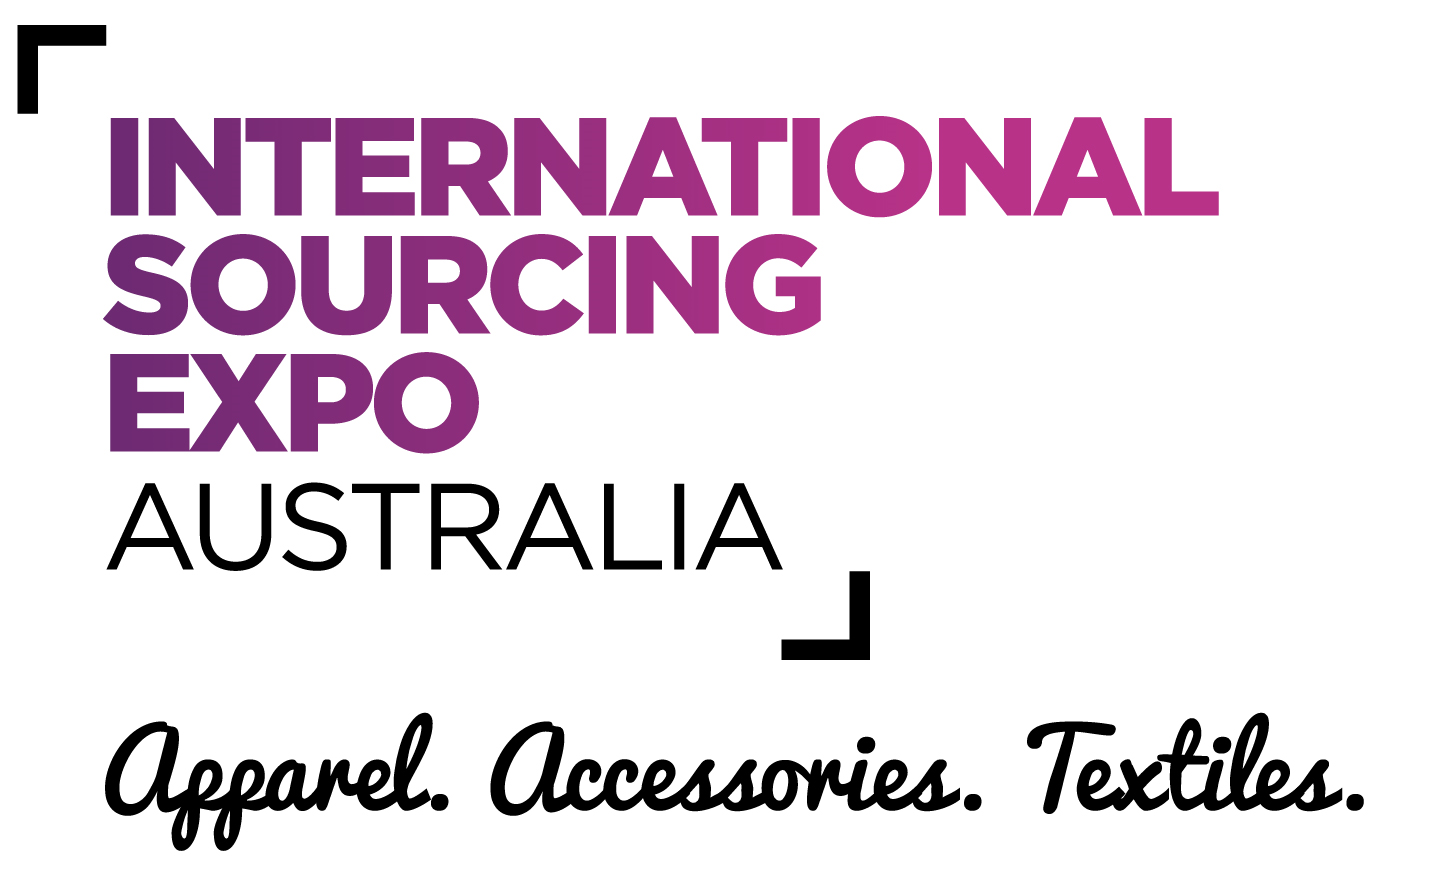 International Sourcing Expo